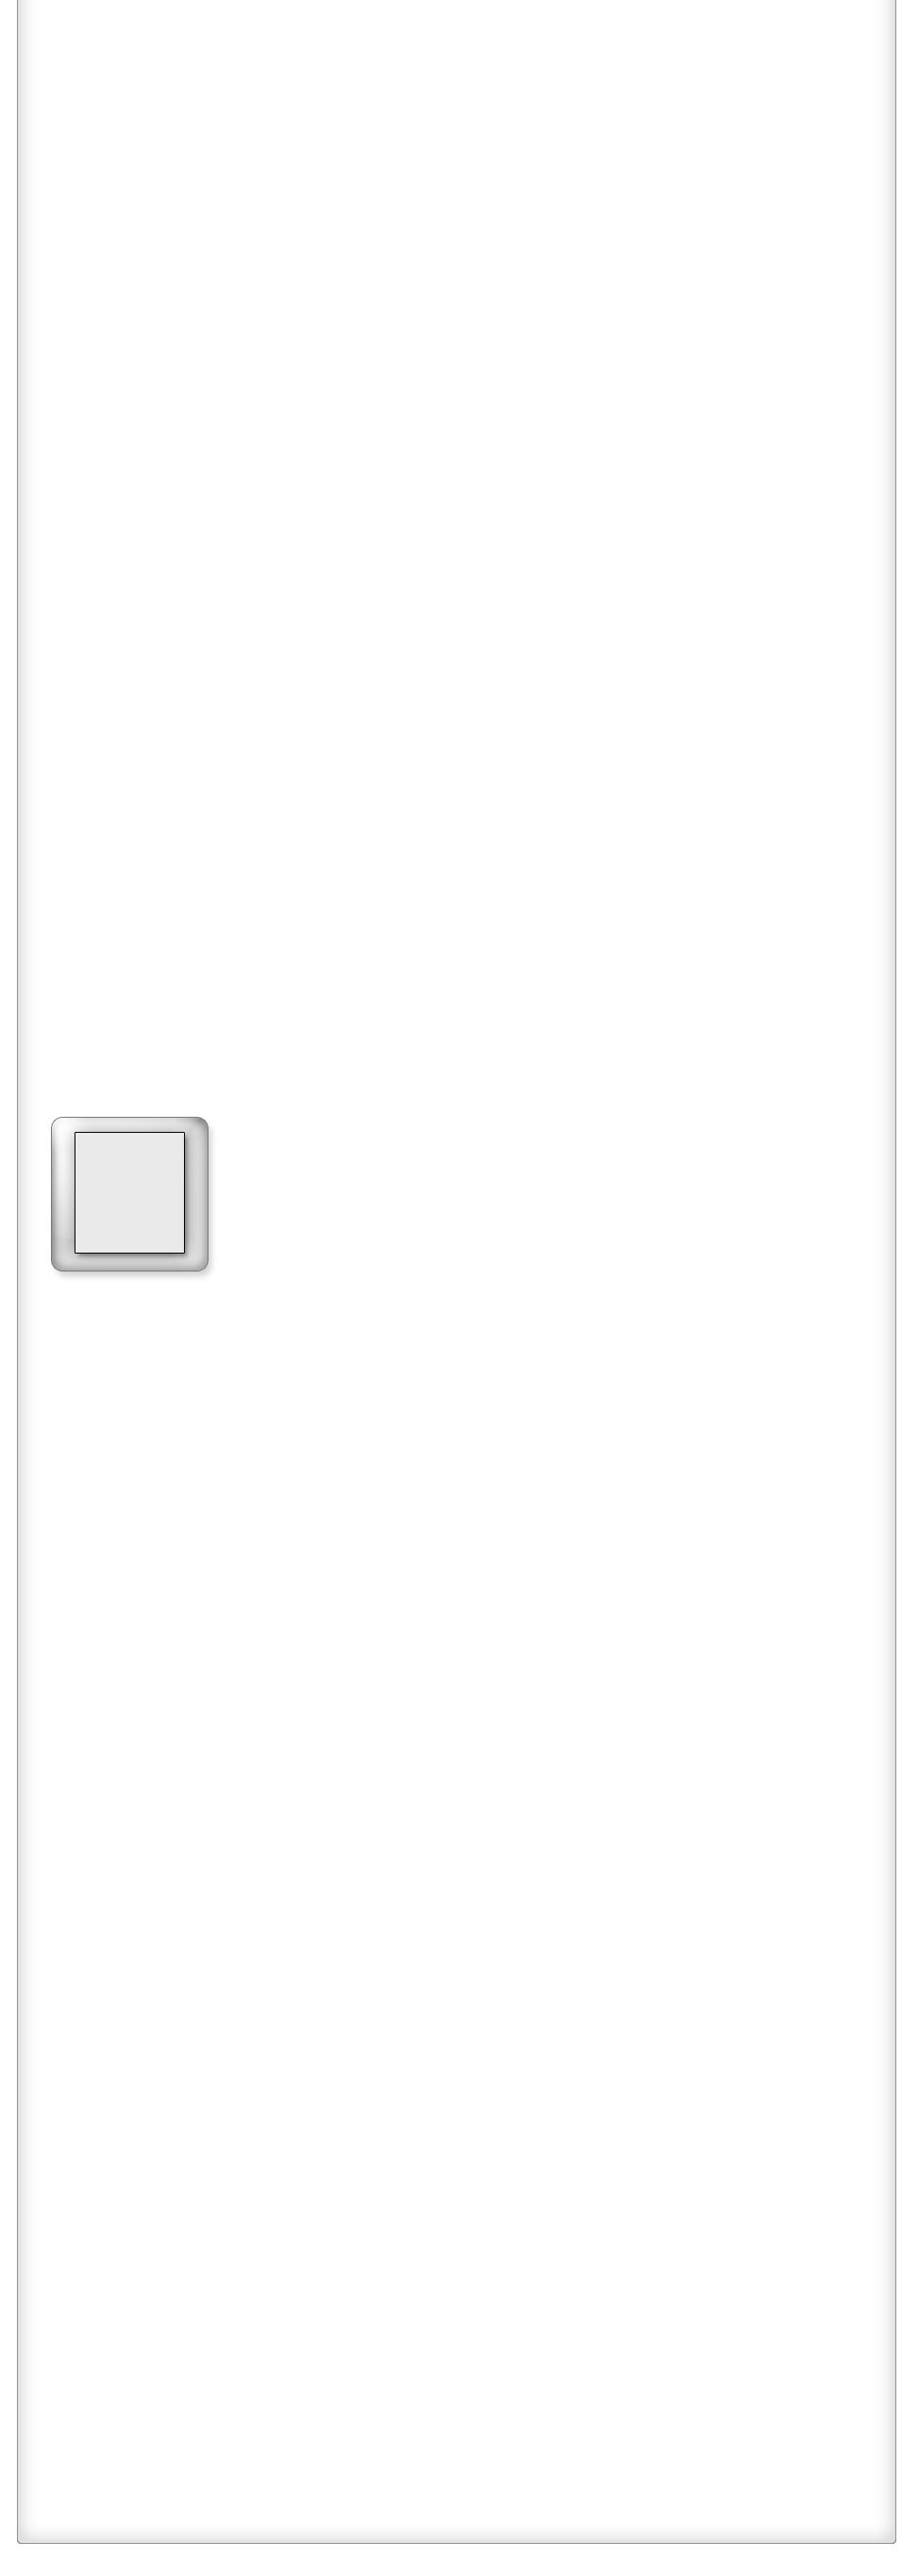 worcester bosch 27cdi manuel d'utilisation